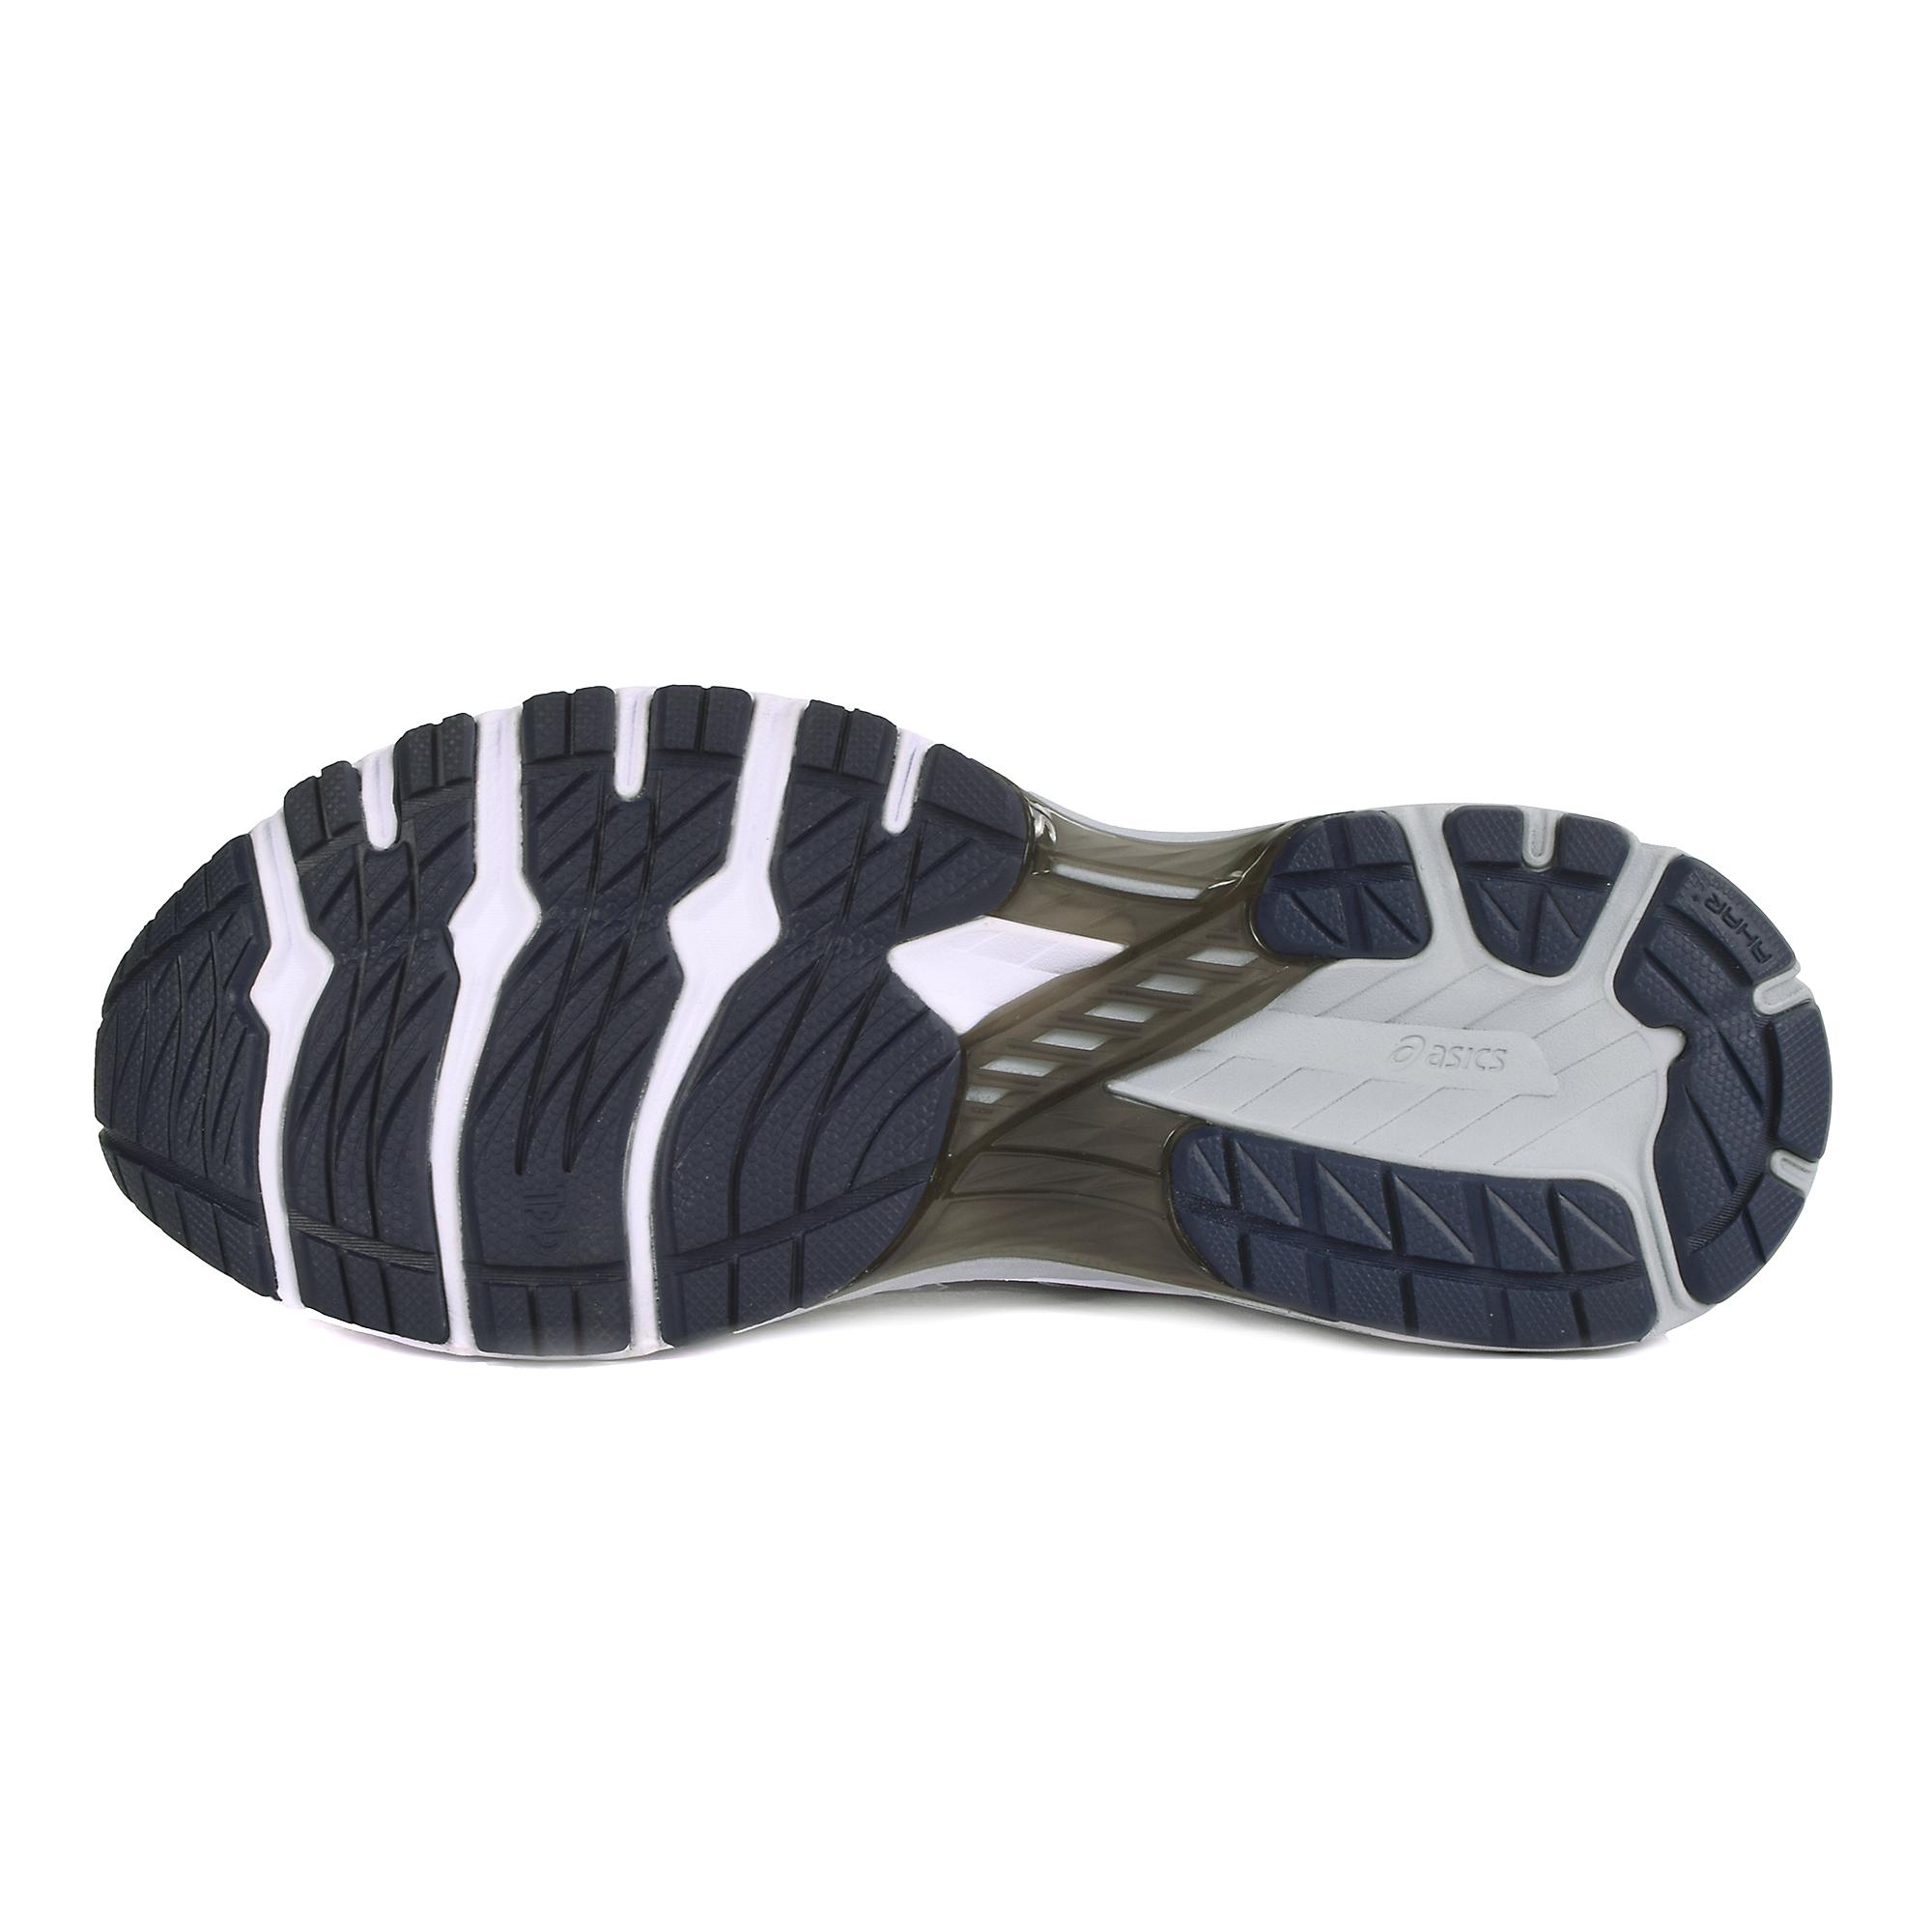 Men's Asics Gt-2000 8 Running Shoe - Color: Piedmont Grey (Regular Width) - Size: 7, Grey, large, image 4